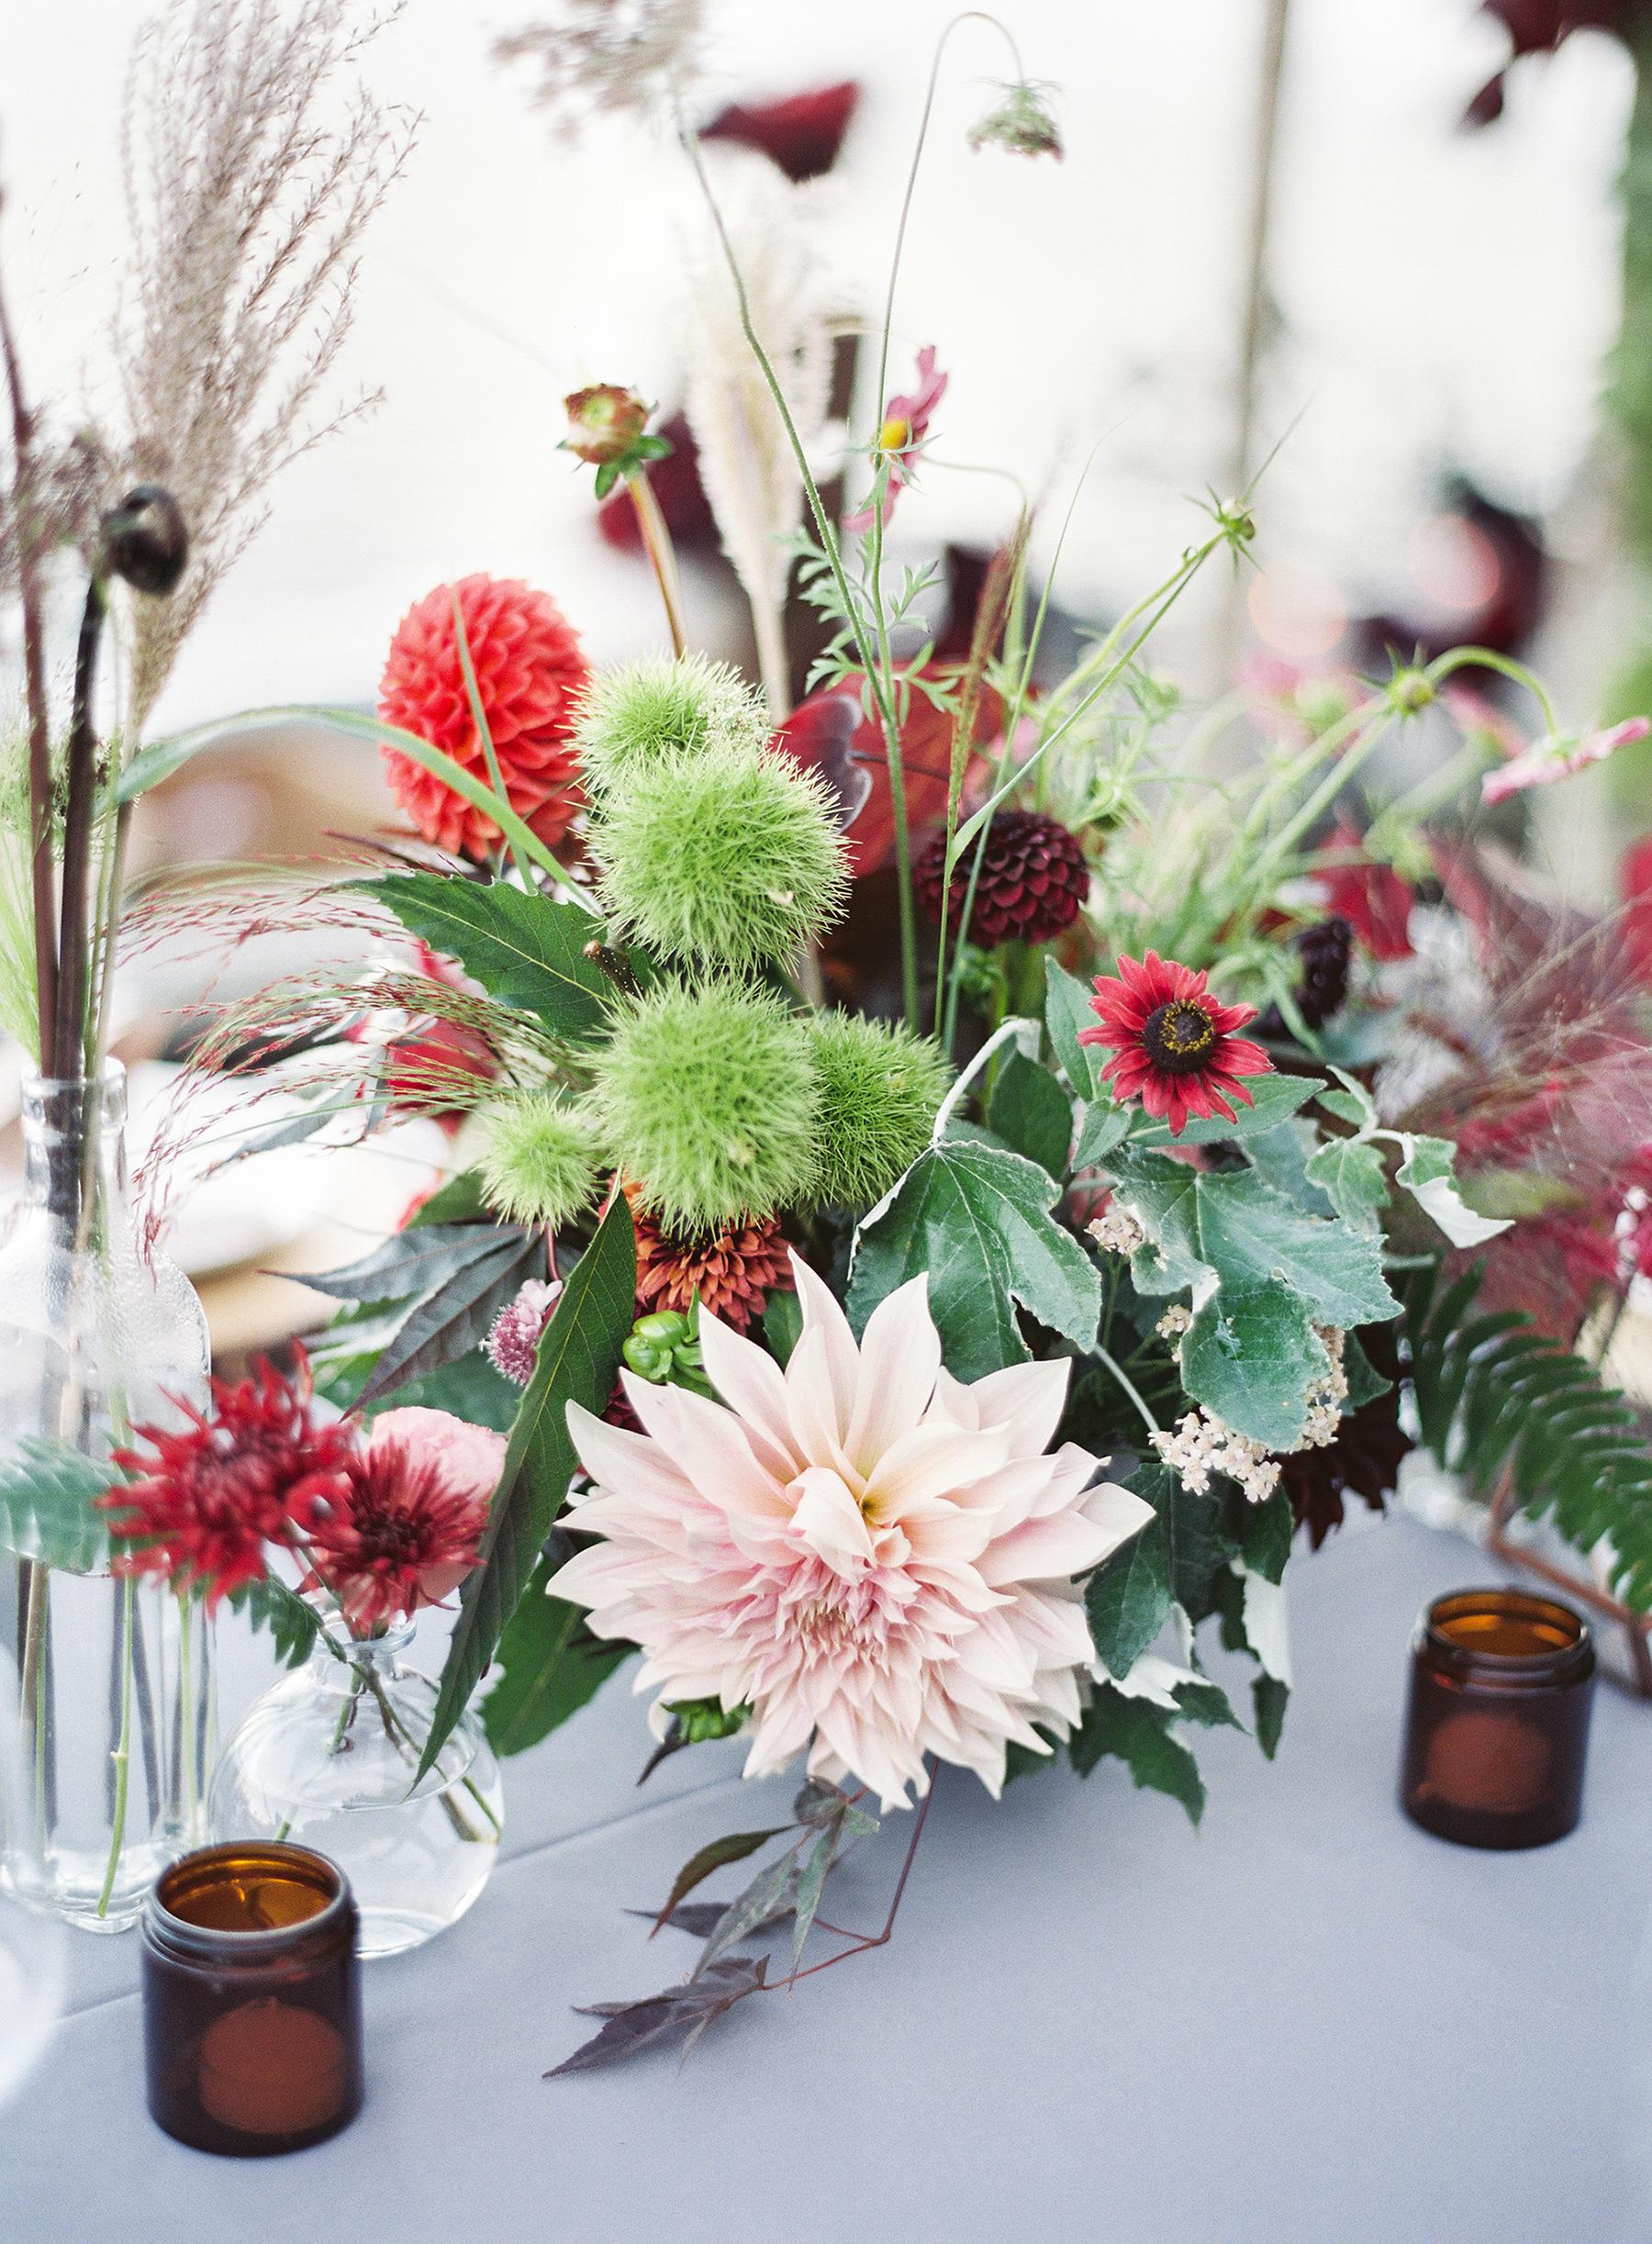 jewel-toned centerpiece with blush dahlia